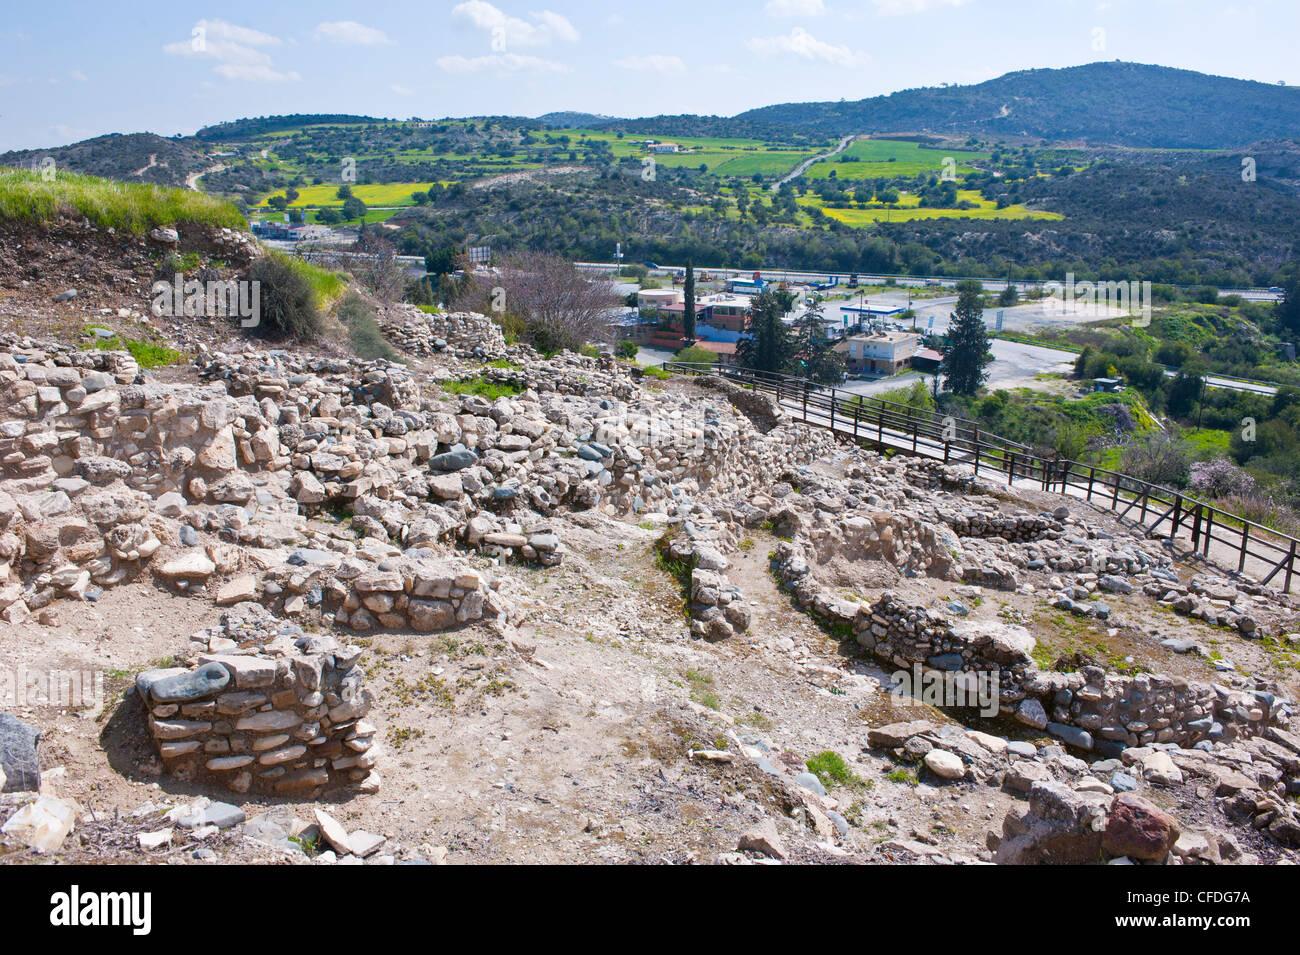 Neolithic excavations of Choirokoitia, UNESCO World Heritage Site, Cyprus, Europe Stock Photo